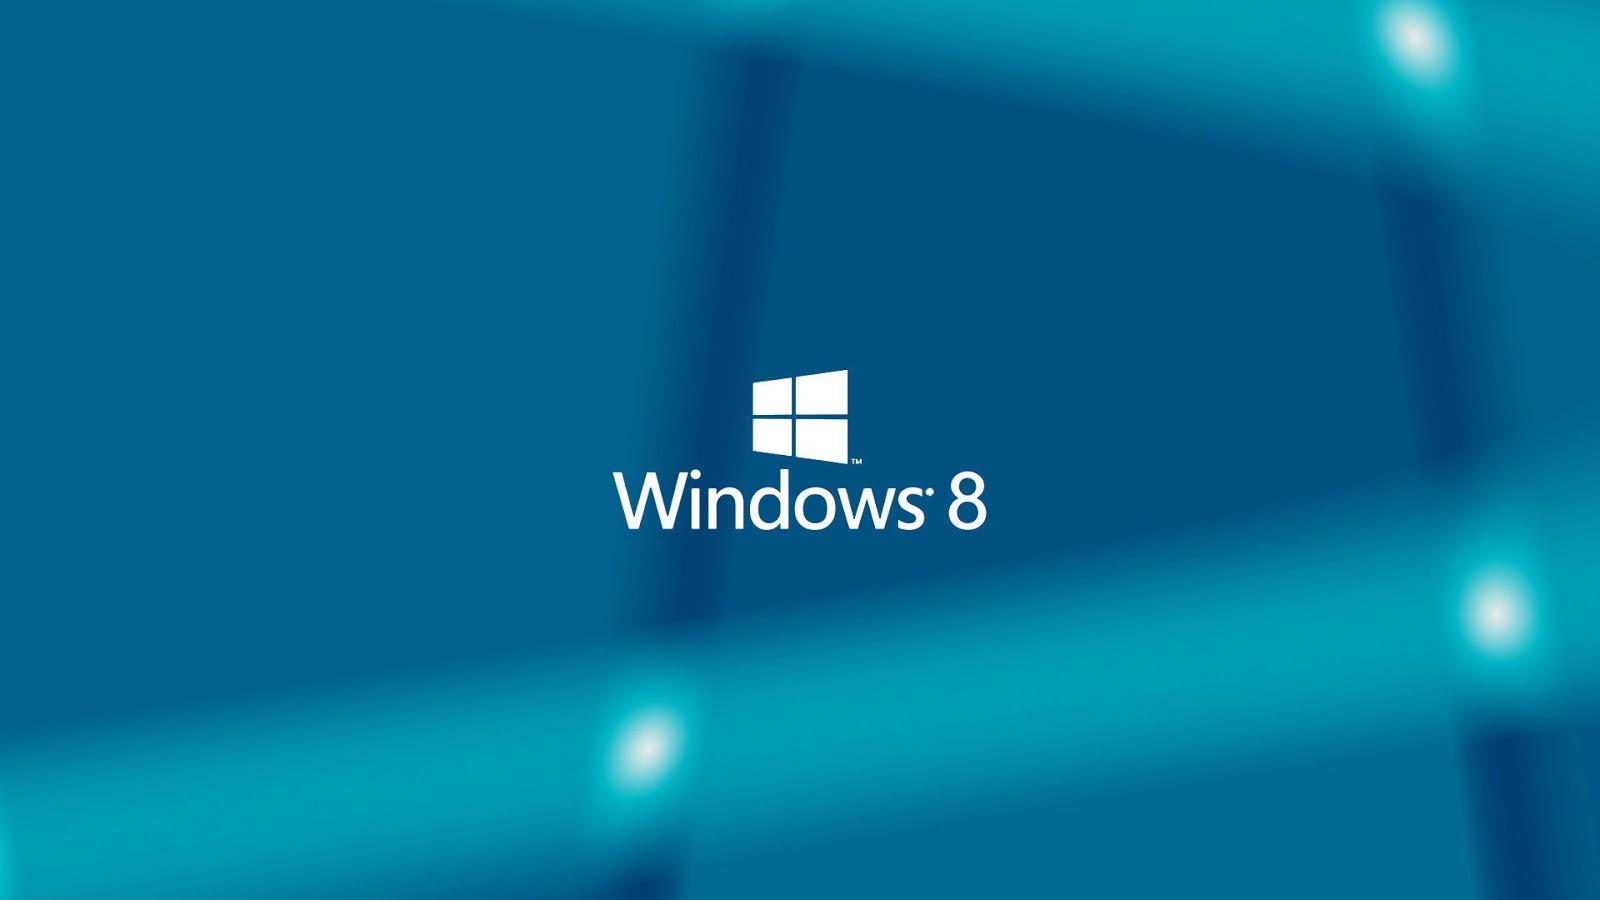 windows 8 iso torrent magnet